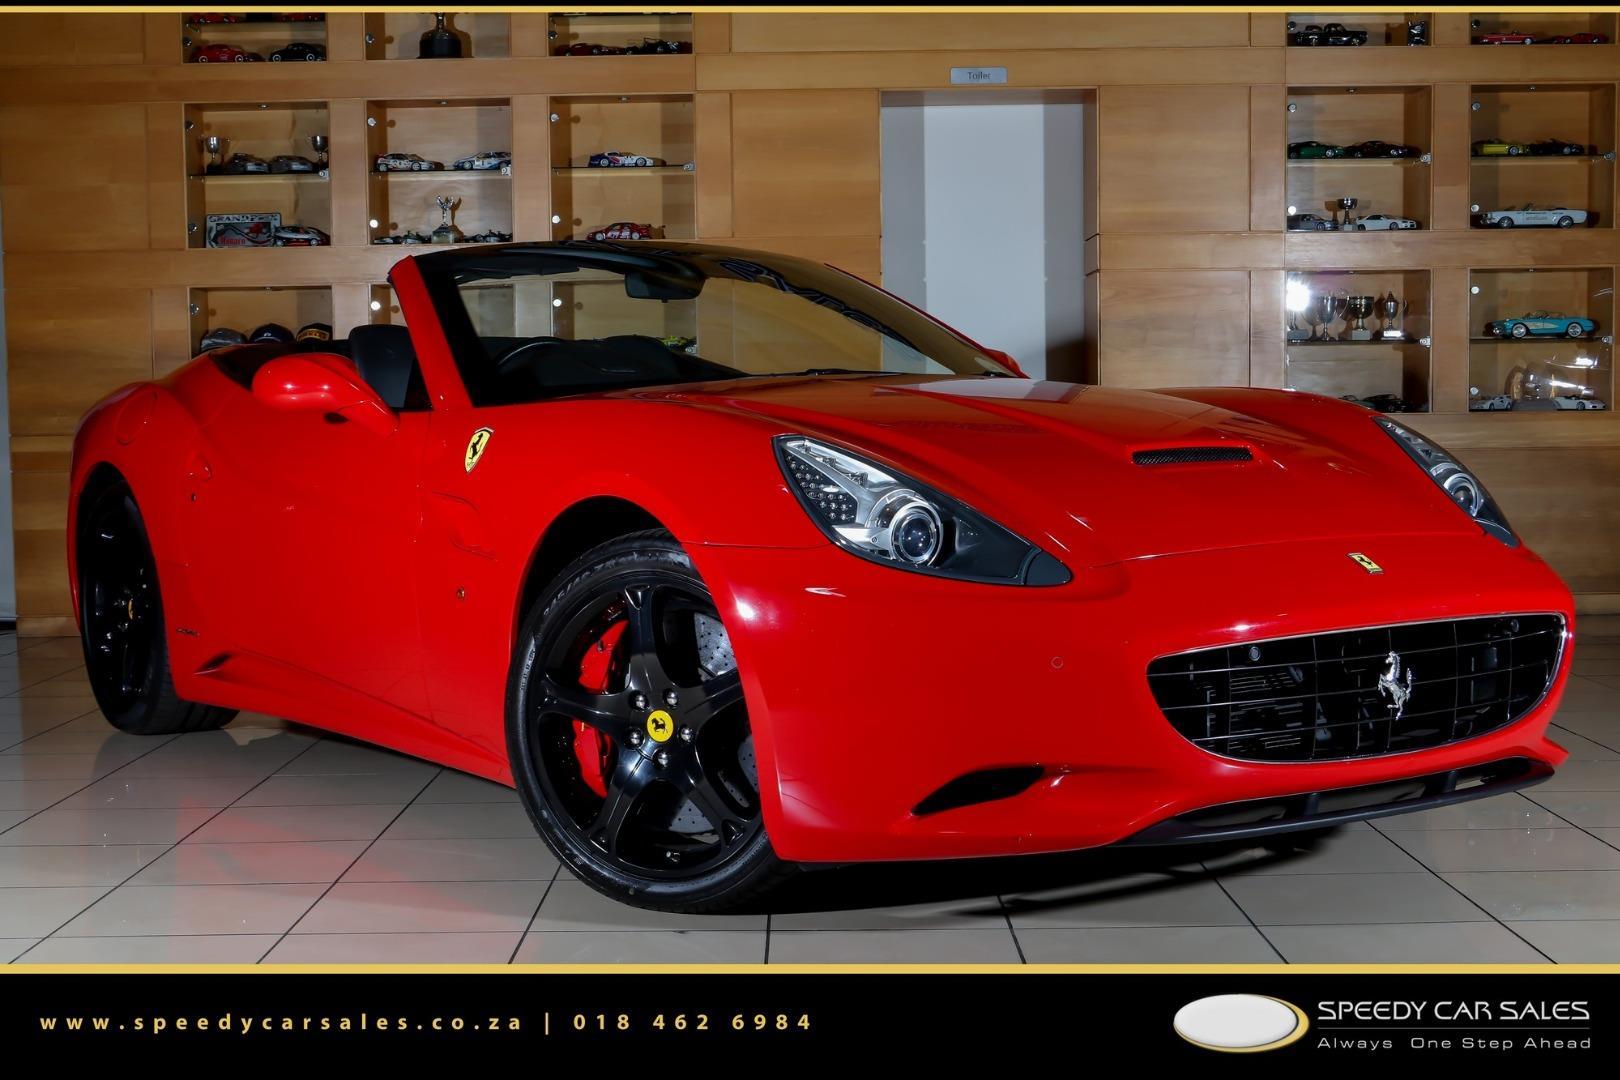 Ferrari California (California) at Speedy Car Sales